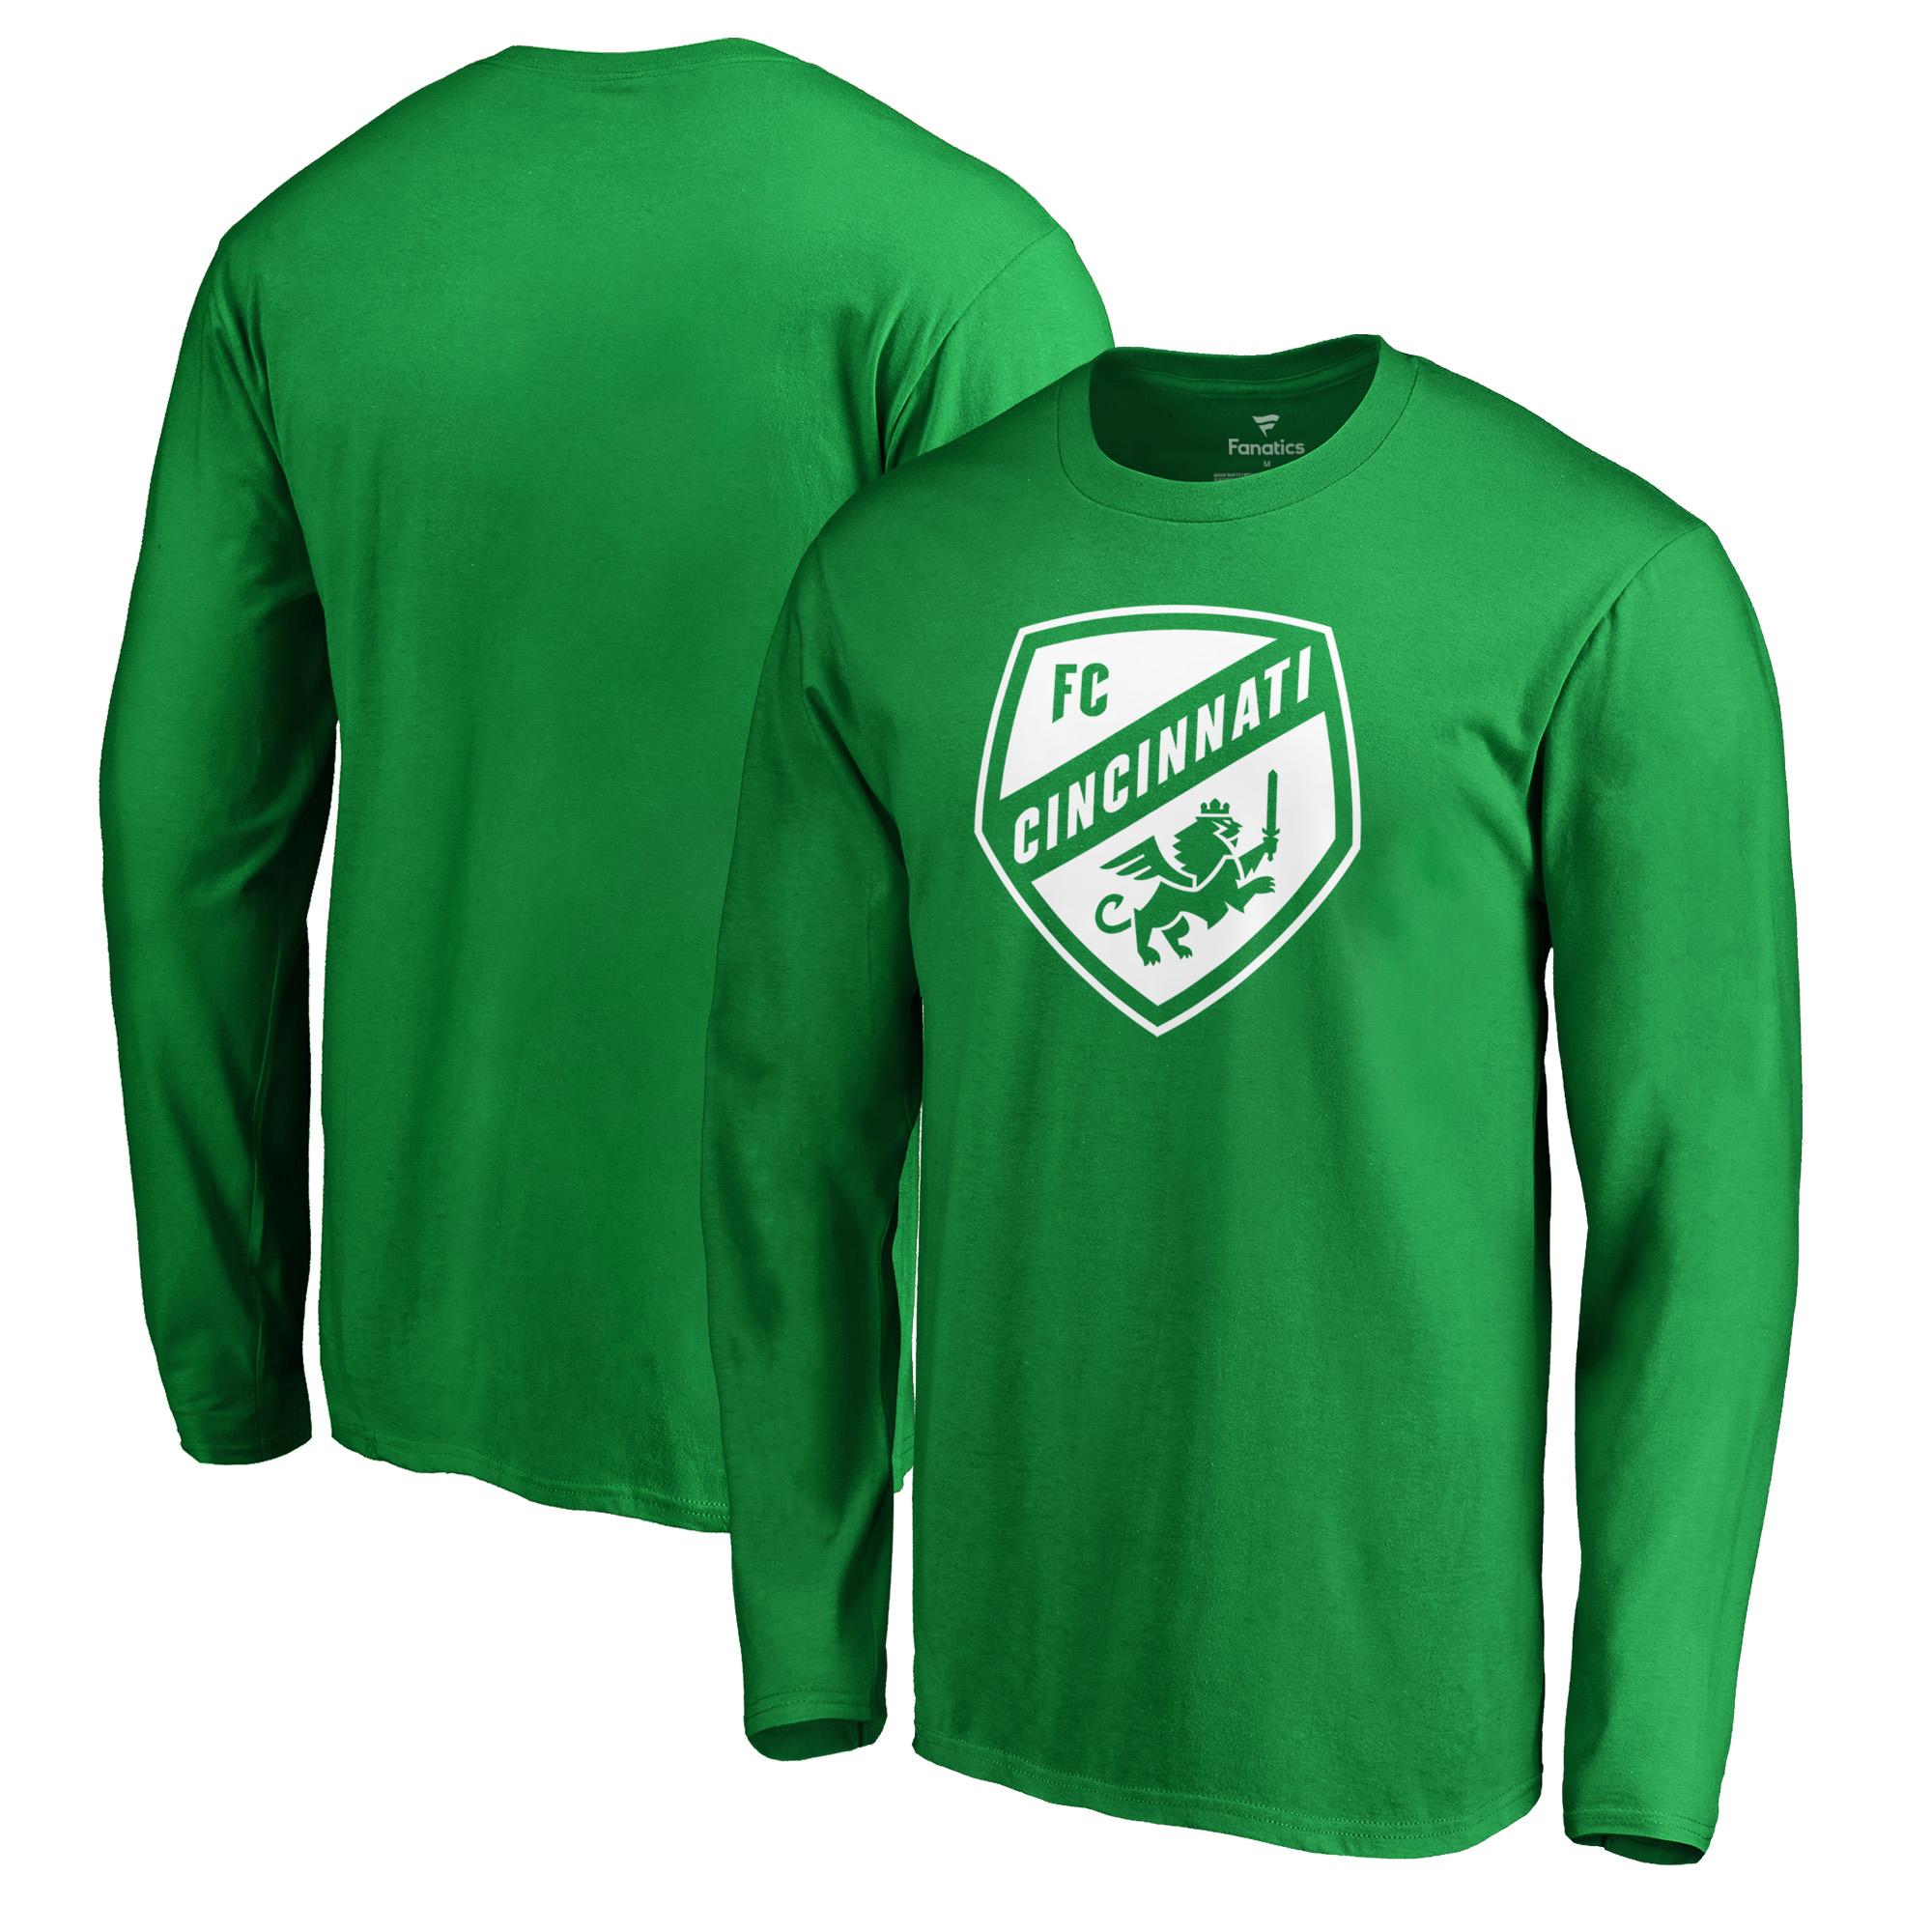 FC Cincinnati Fanatics Branded St. Patrick's Day White Logo Long Sleeve T-Shirt - Kelly Green